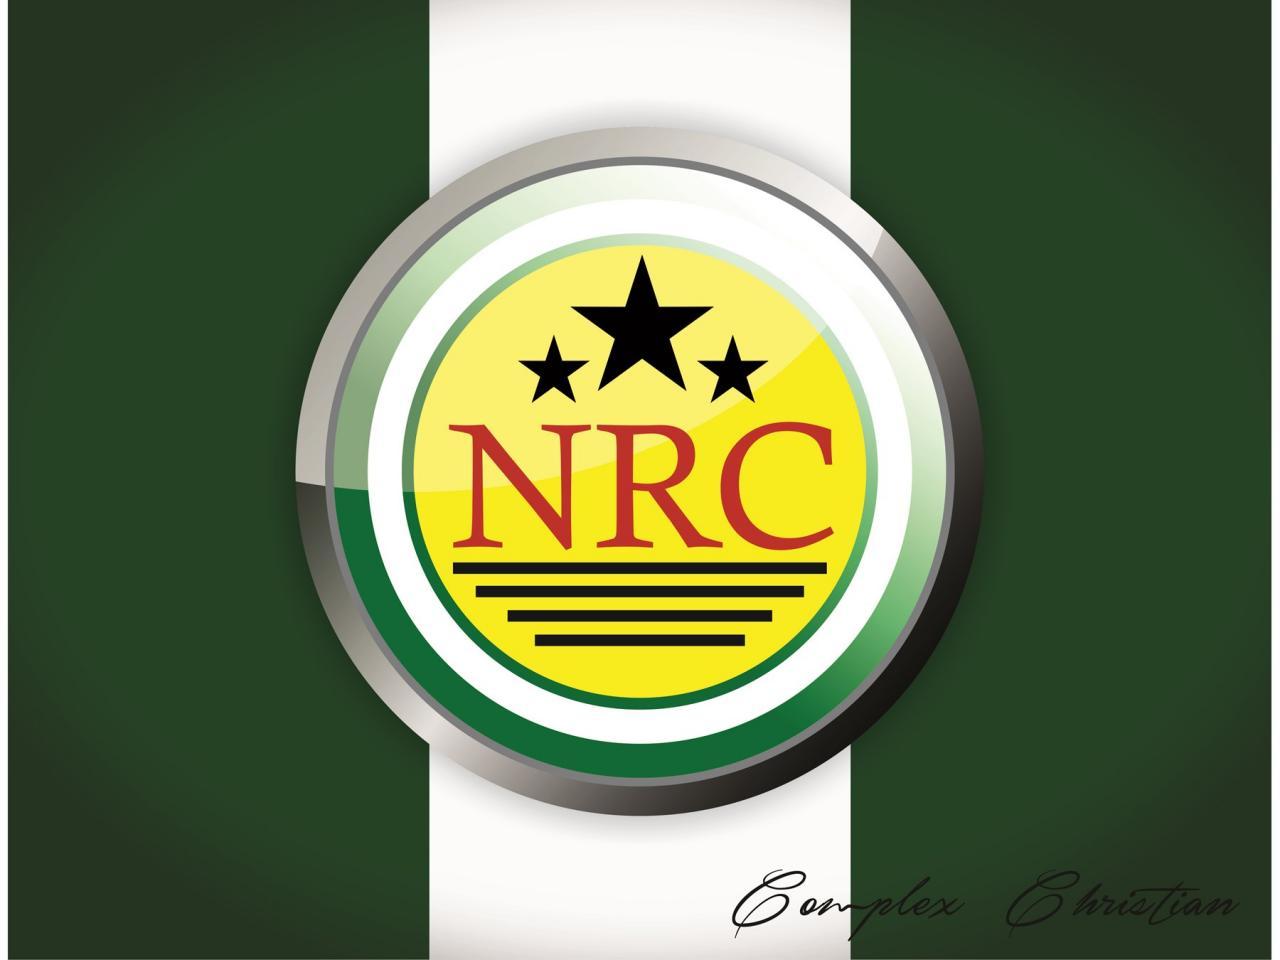 The Nigerian Railway Corporation (NRC)